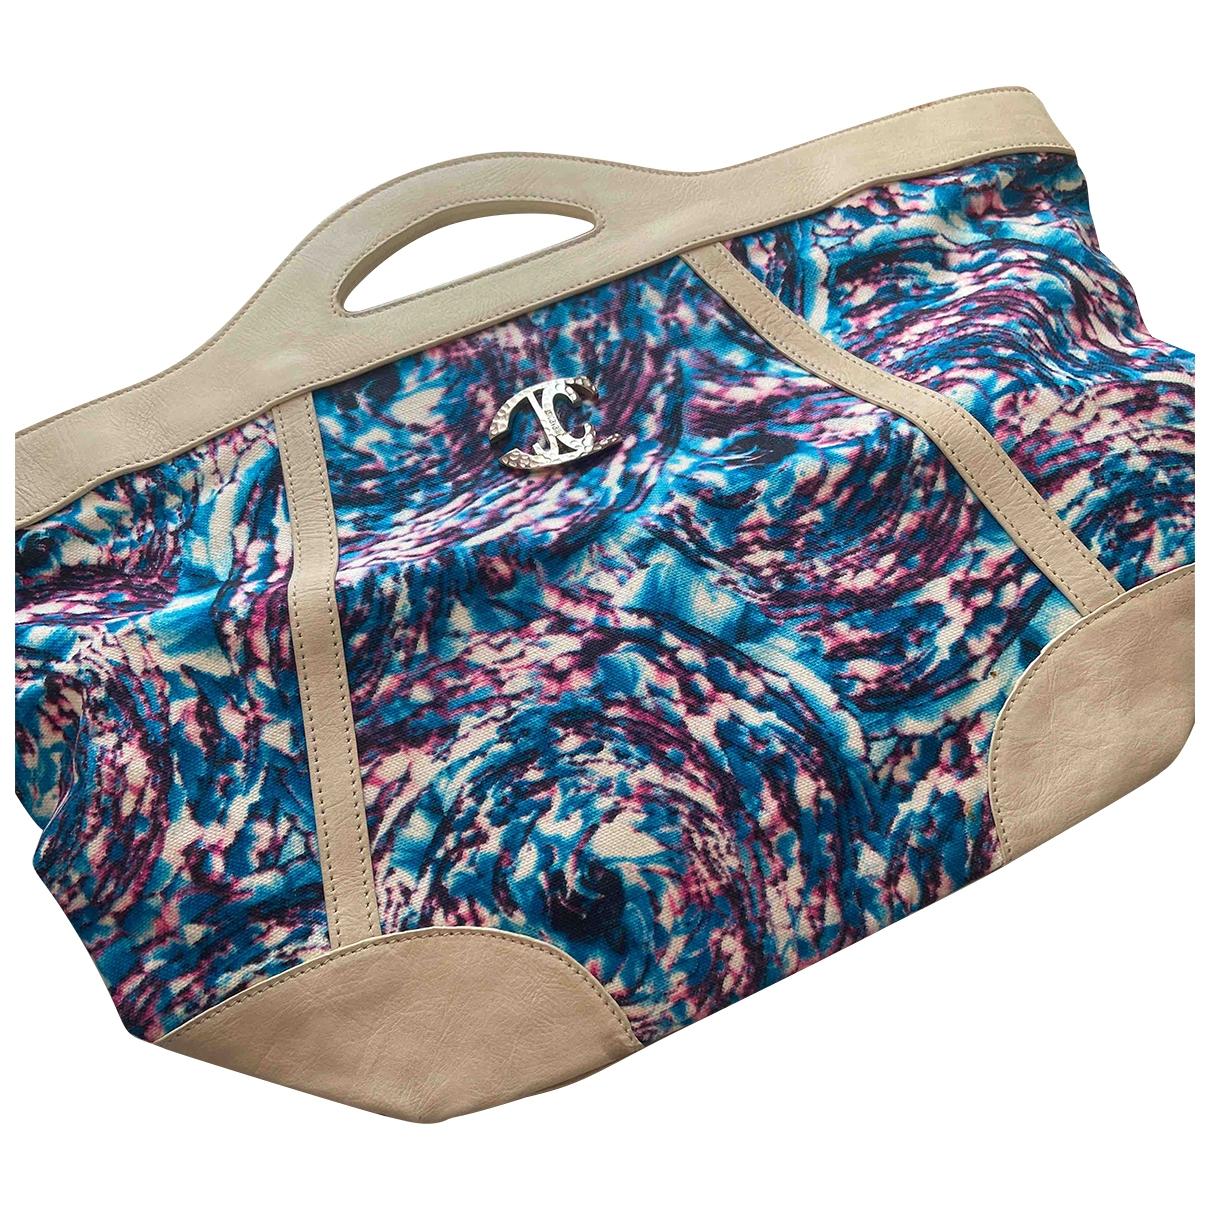 Just Cavalli \N Turquoise Leather handbag for Women \N